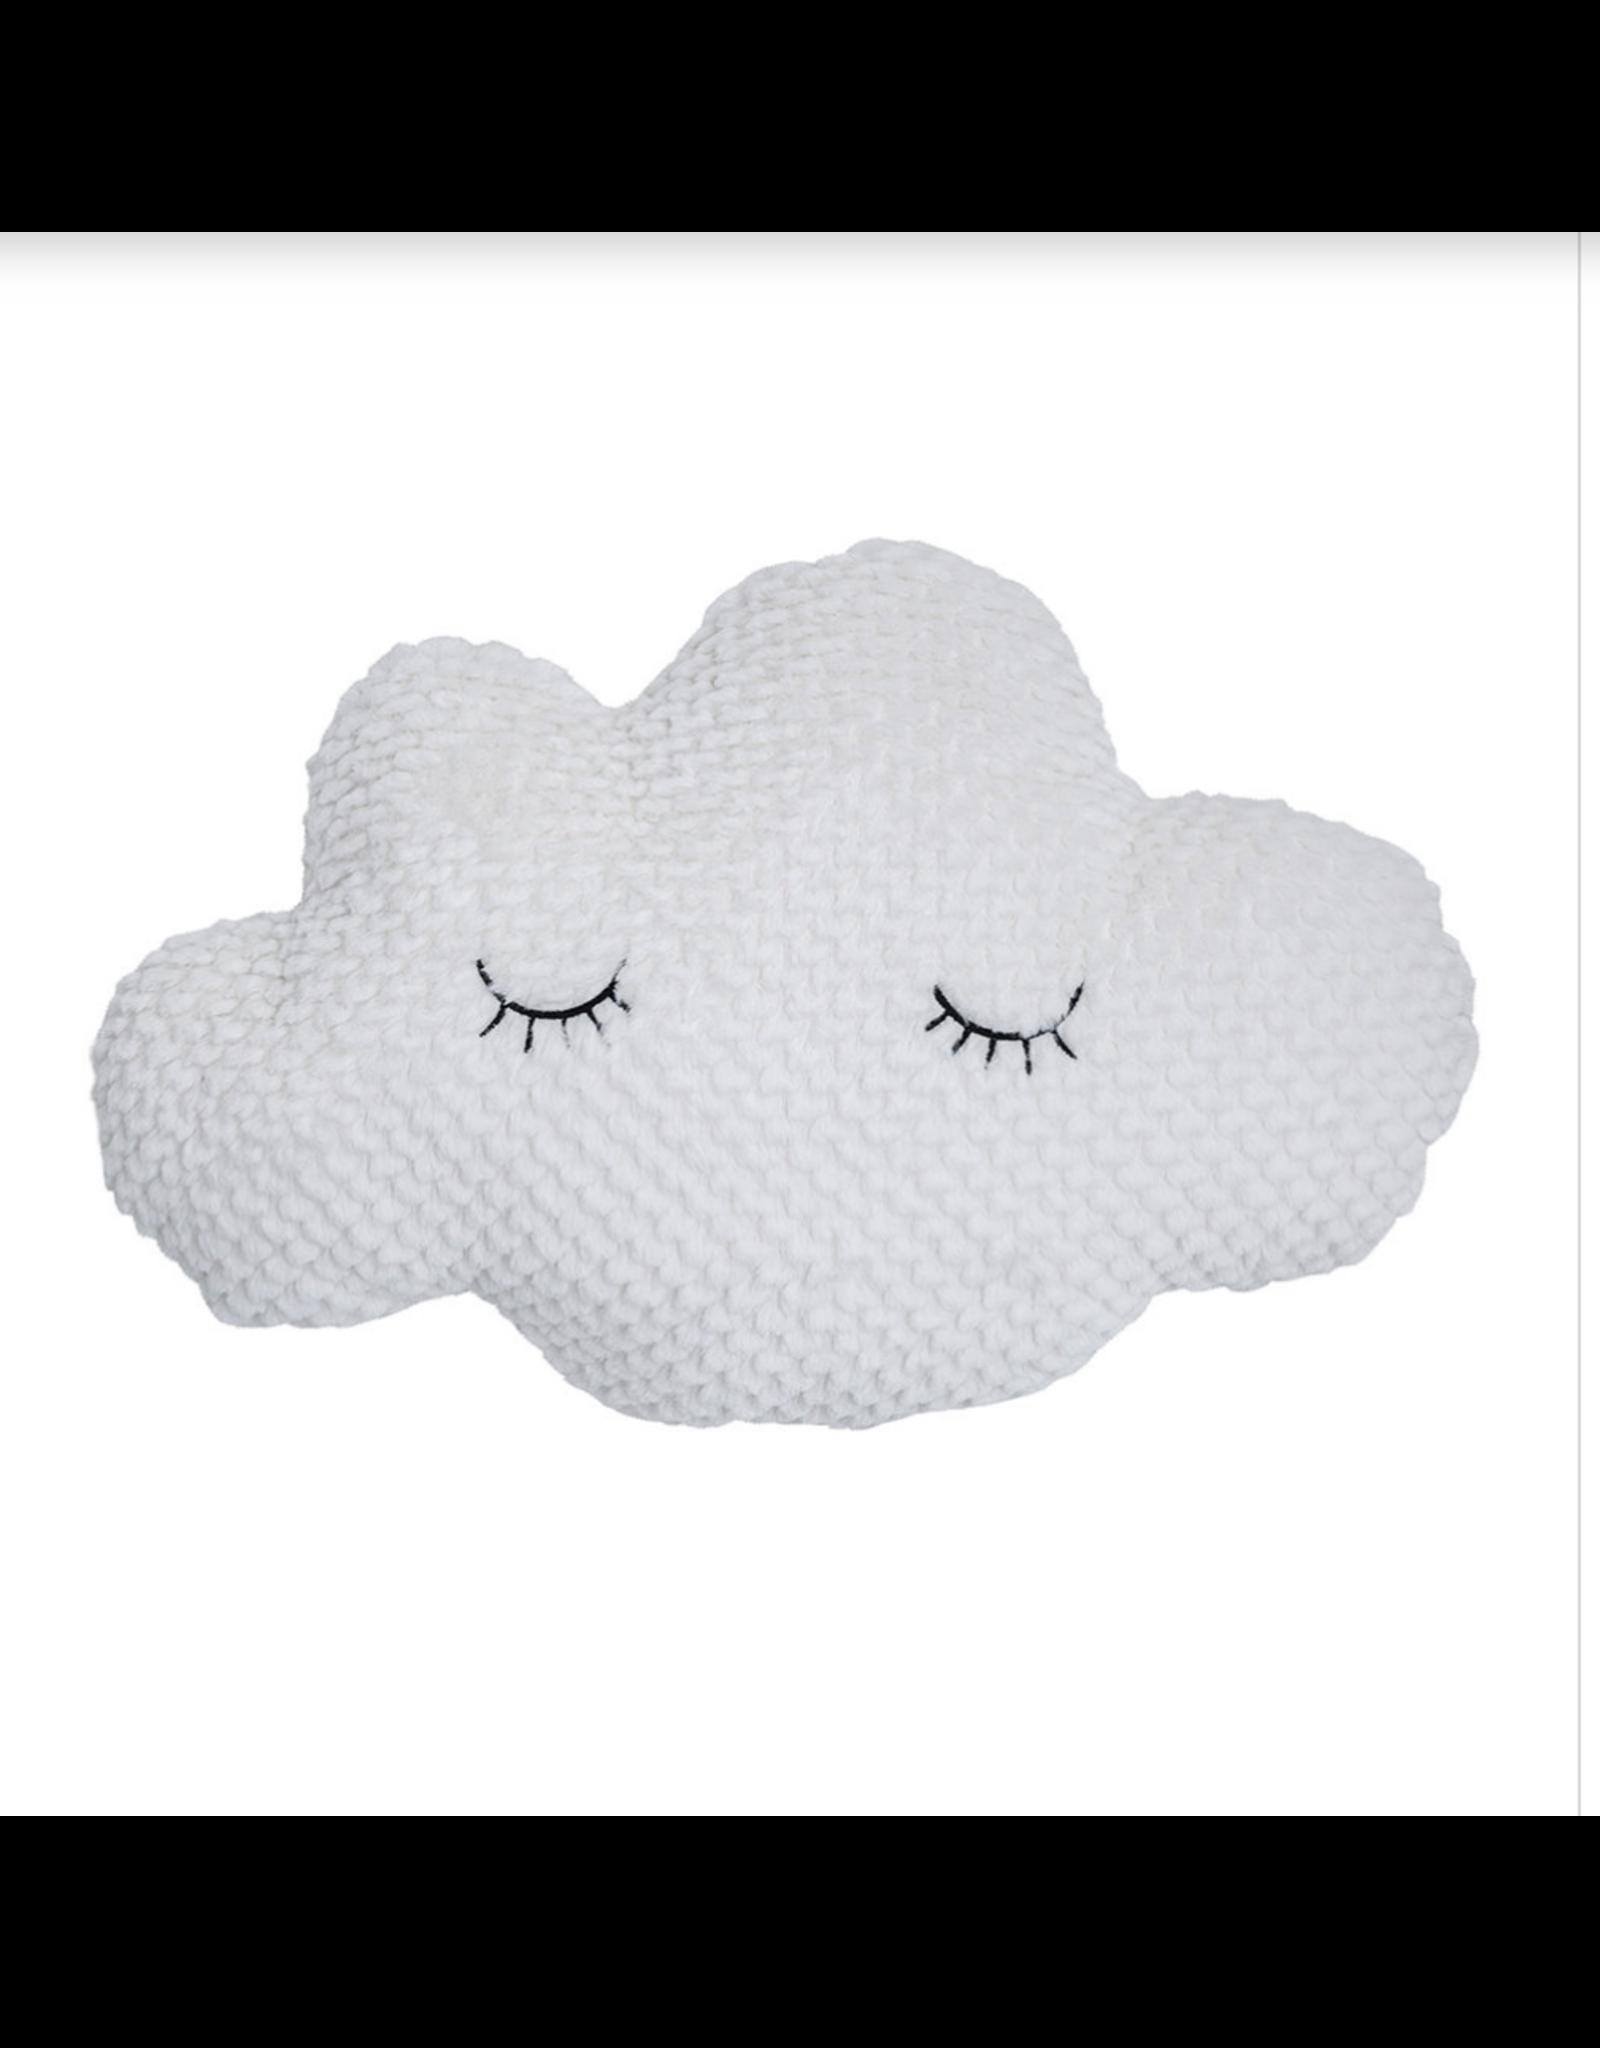 Sleepy Cloud Pillow, white